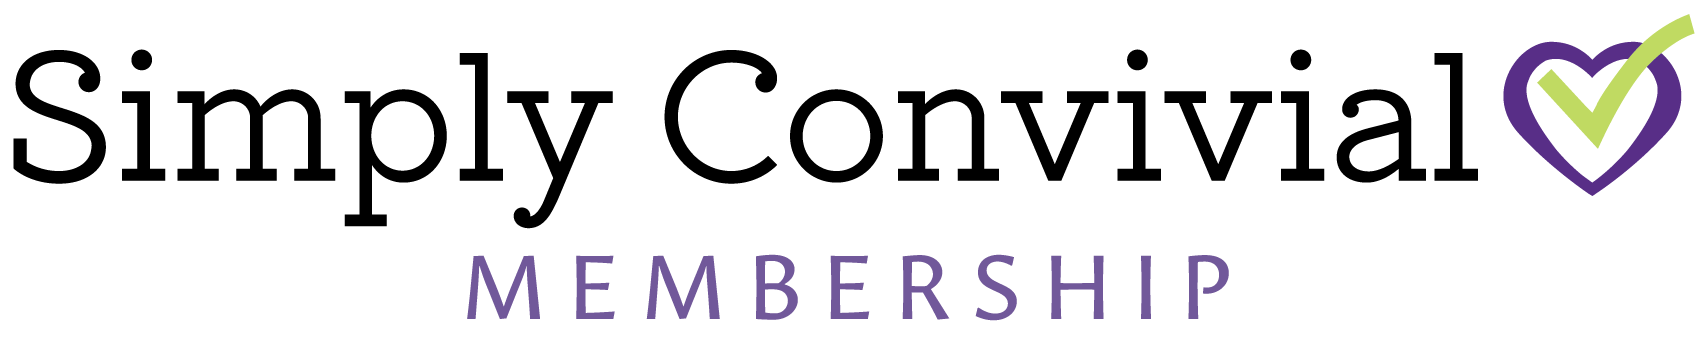 Simply Convivial Membership